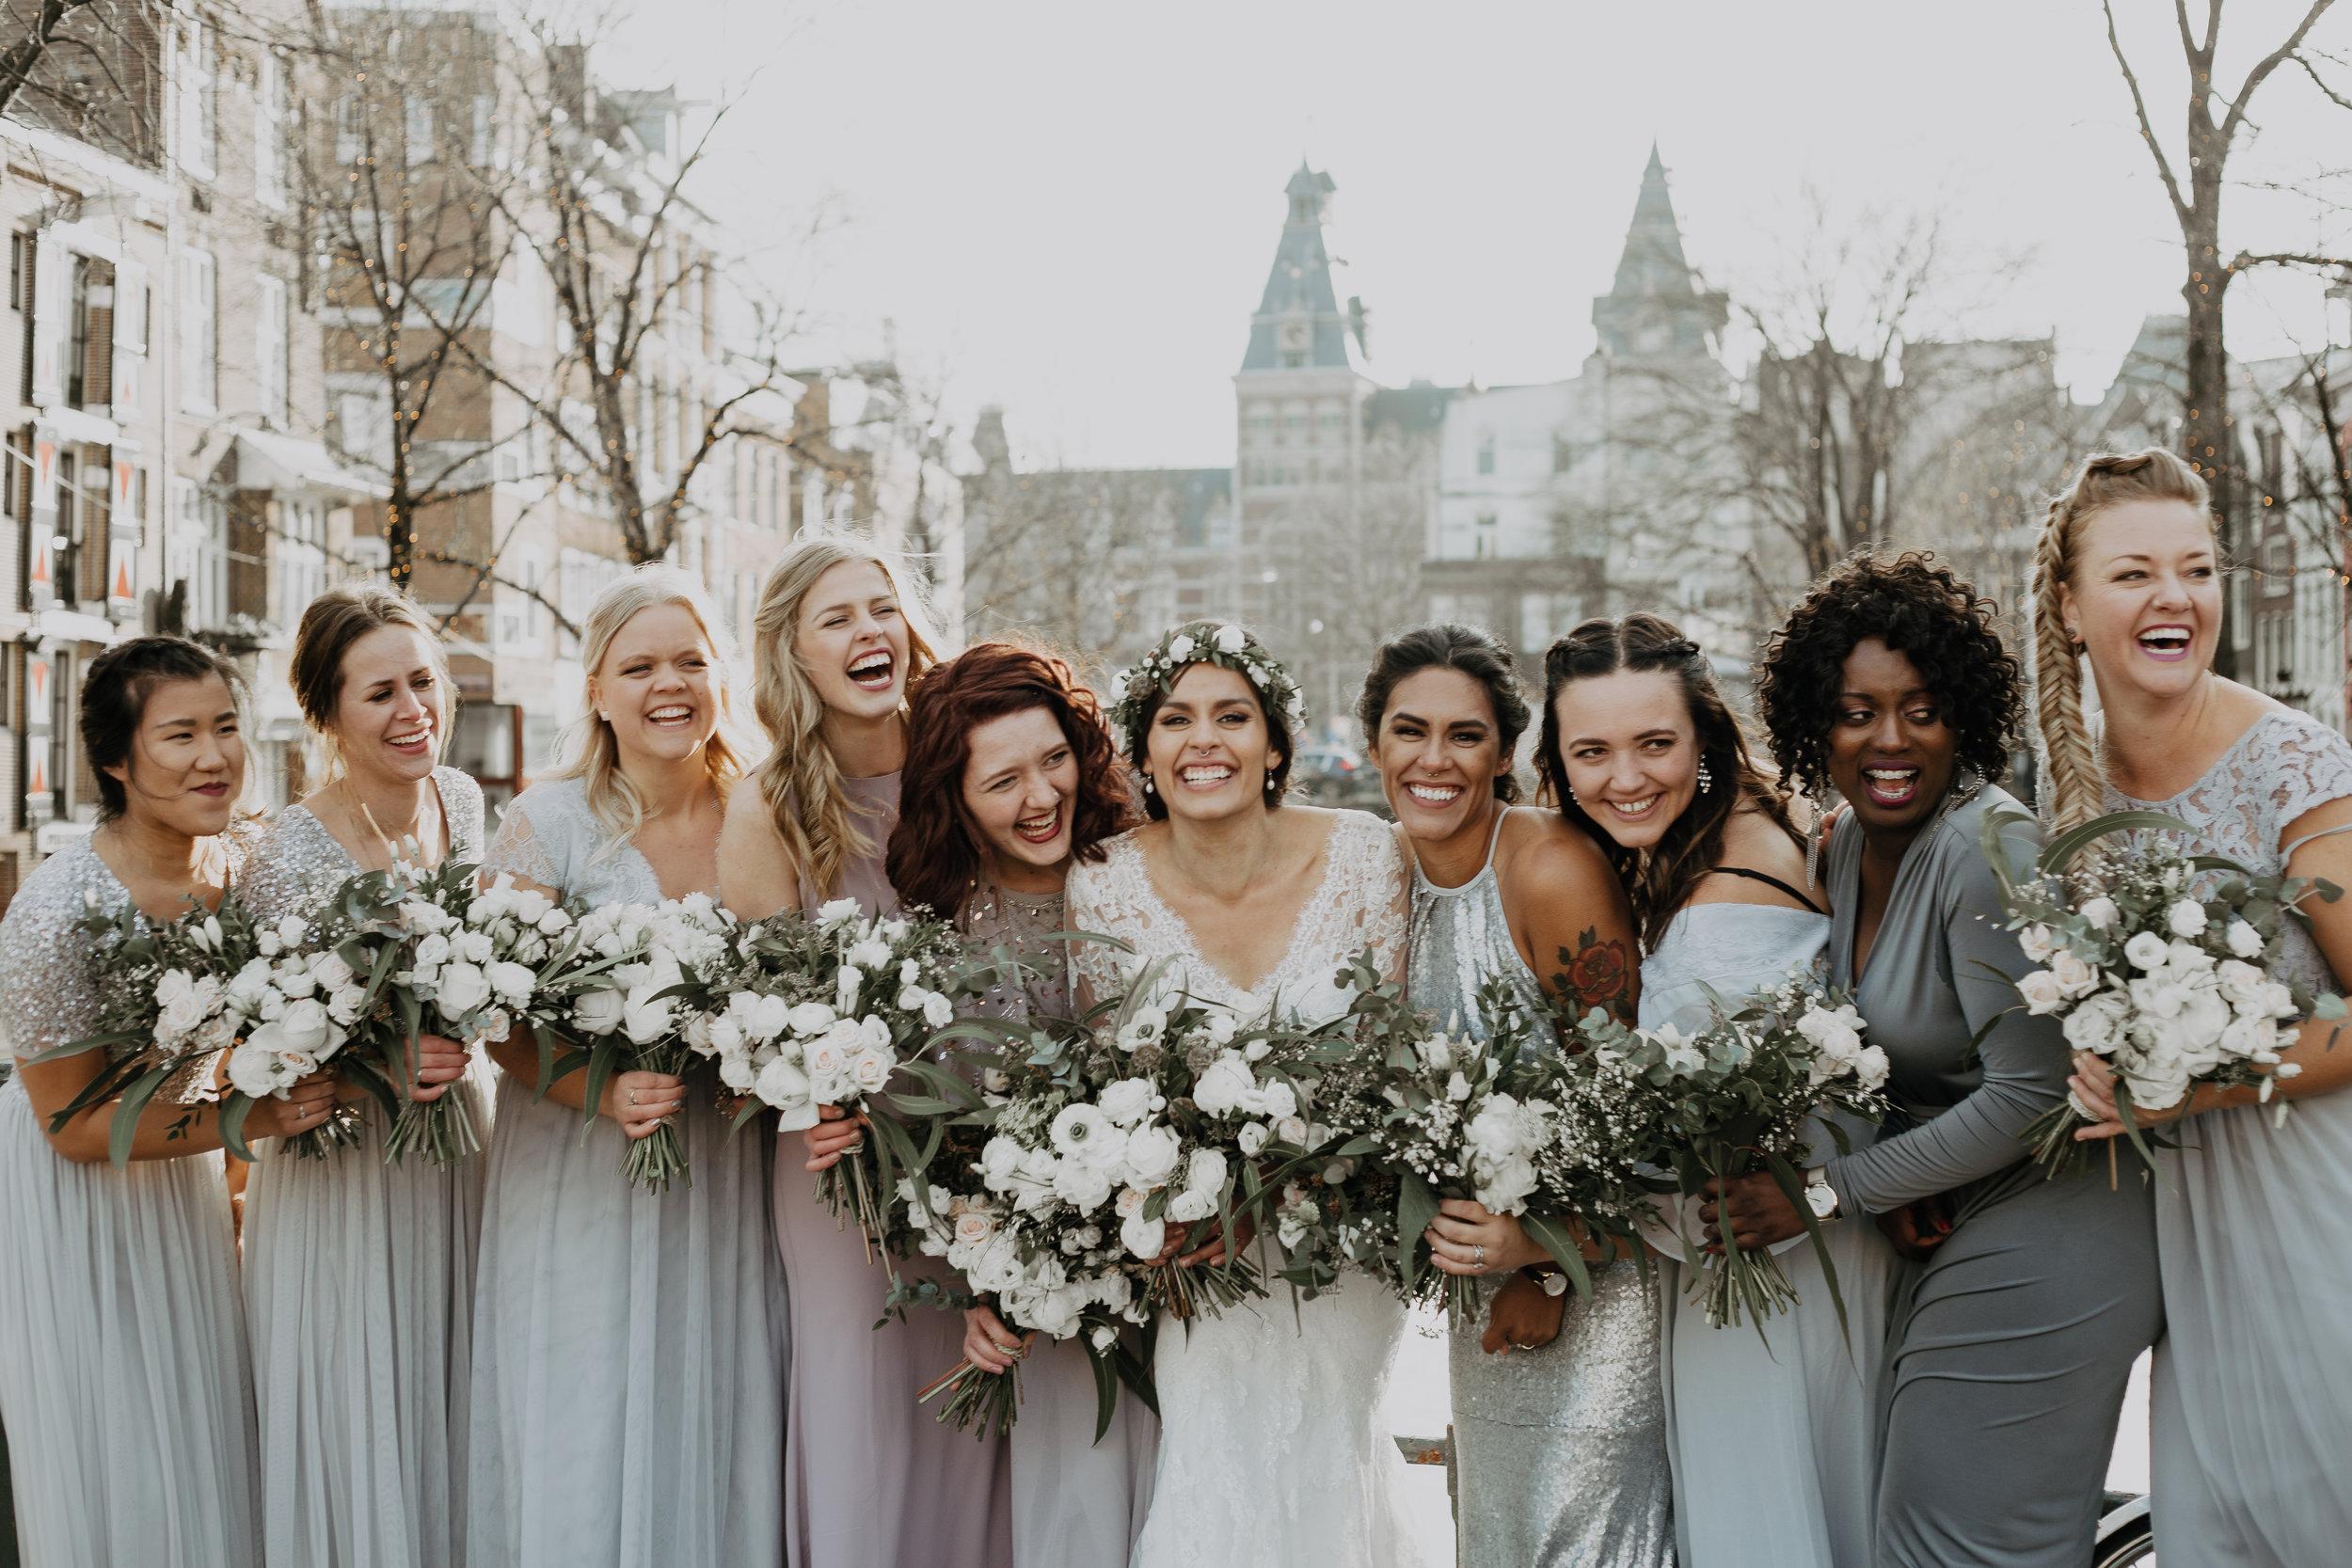 Bridesmaids bouquets natural whites